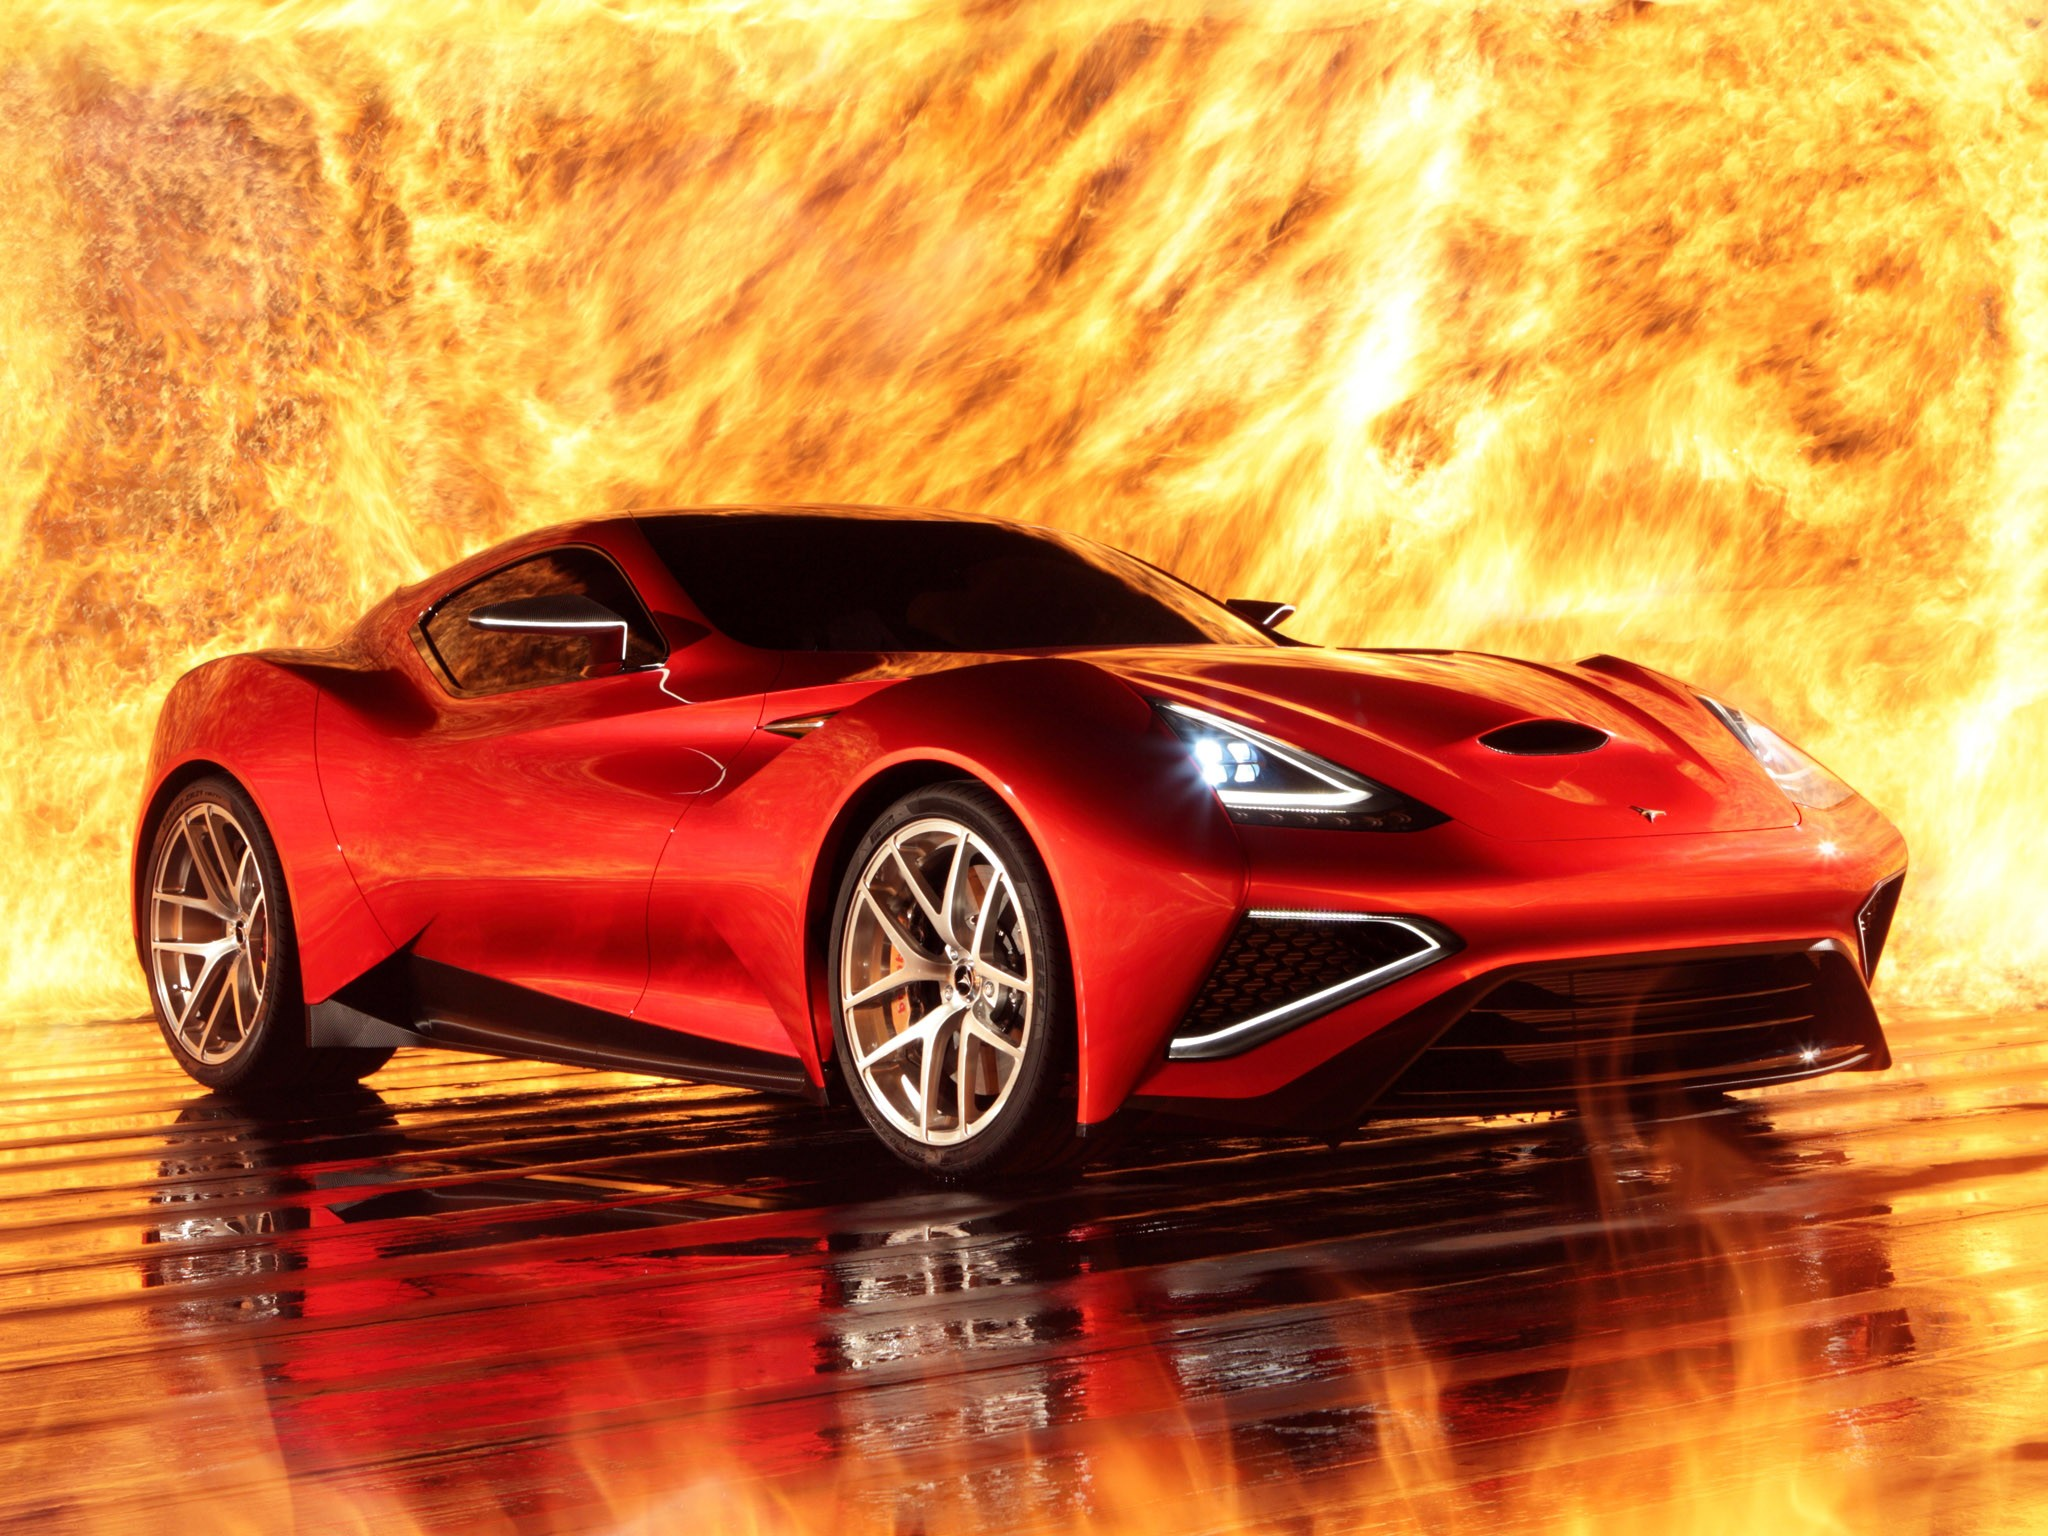 Icona Design Vulcano 2013